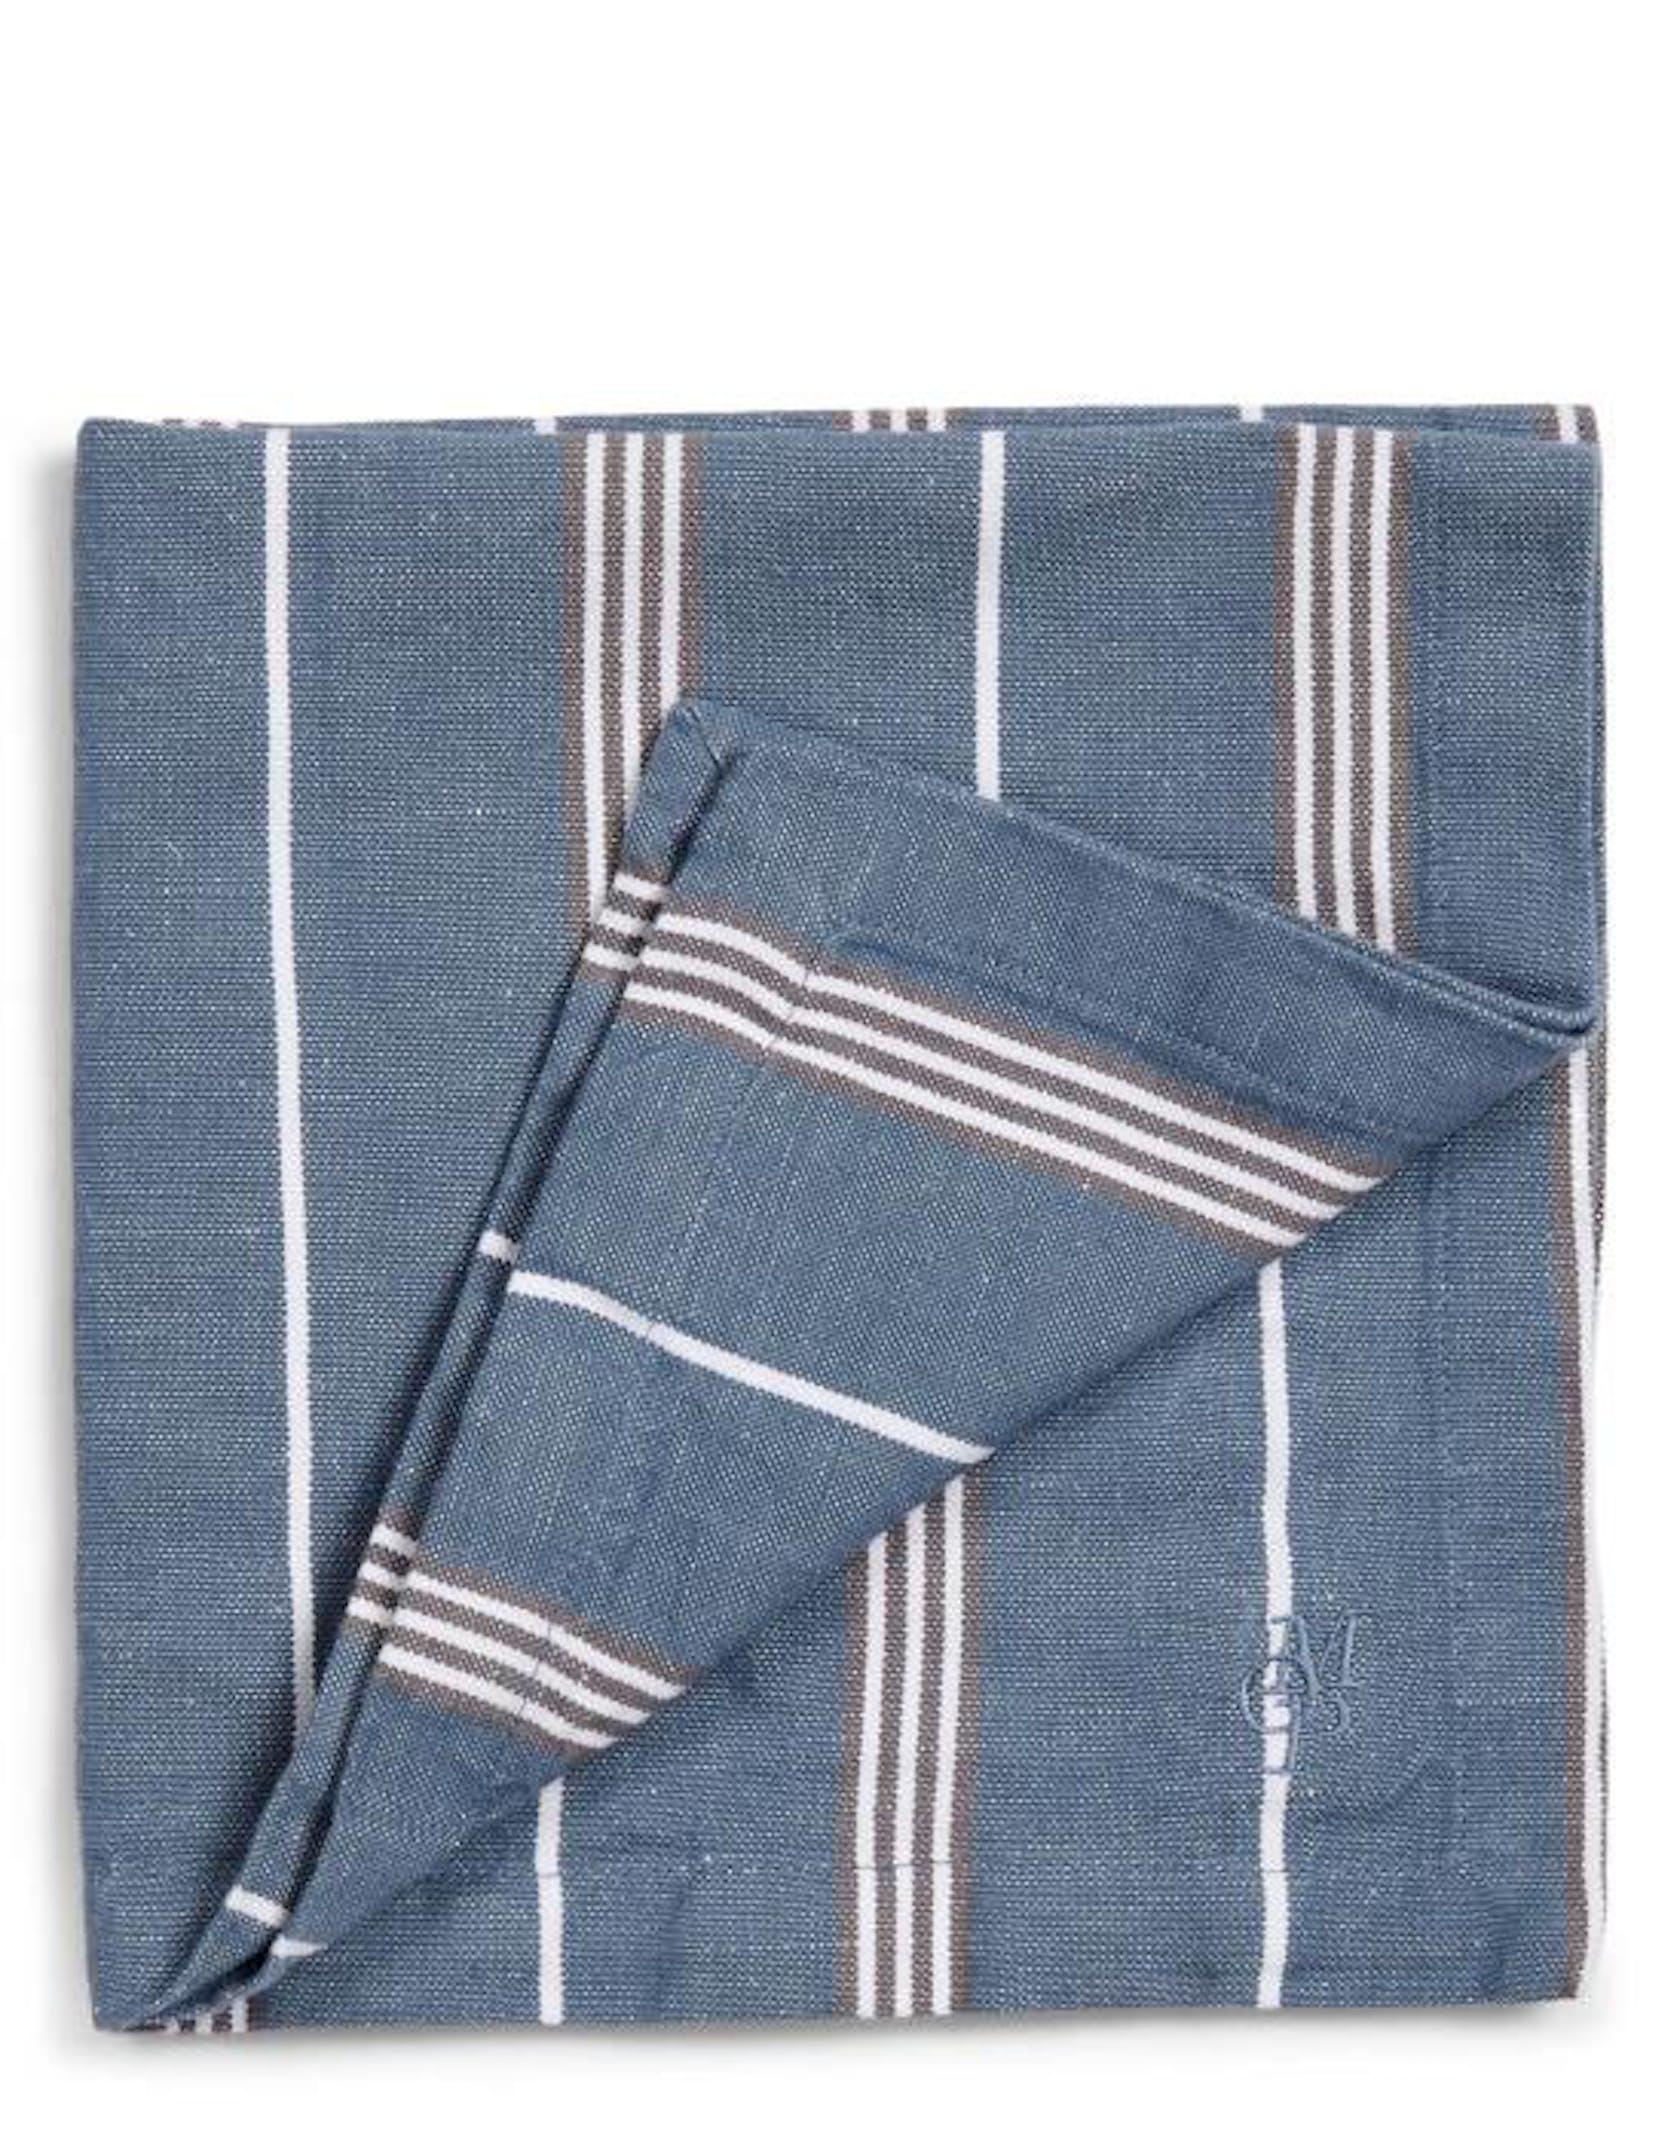 Marc O'Polo Jona Serviette Streifen Smoke Blue